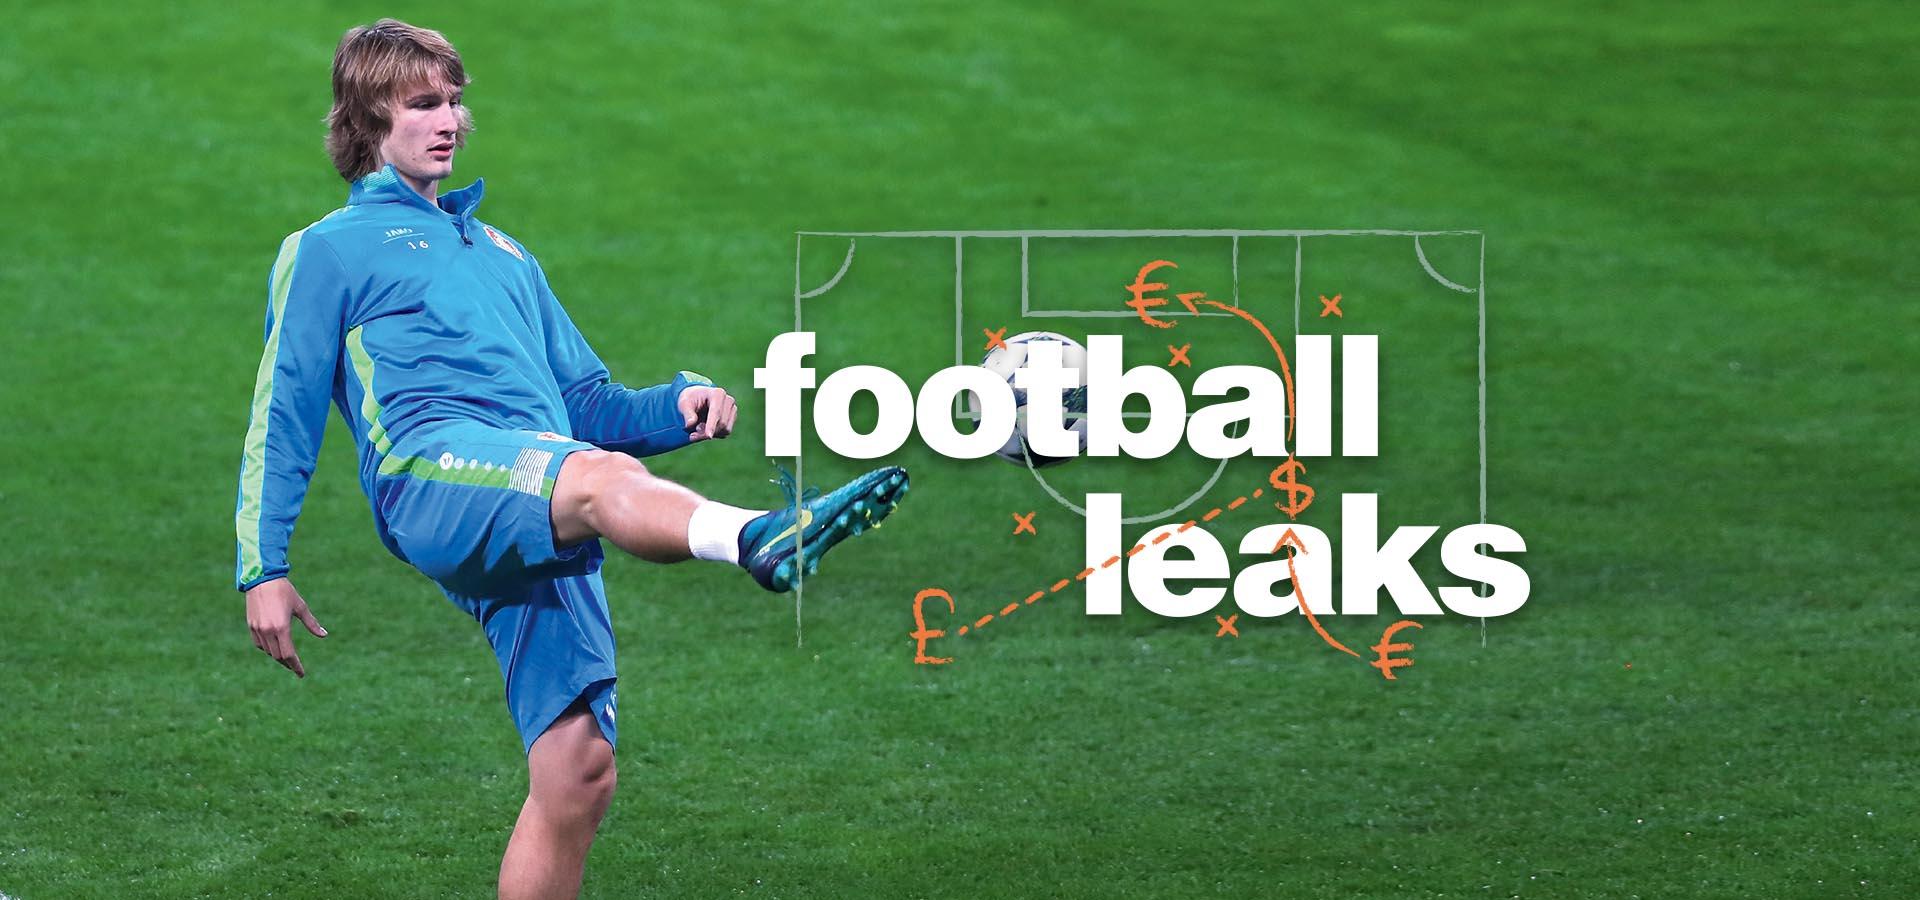 FOOTBALL LEAKS: Kako je Mario Mamić zaradio 725.000 eura na transferu Jedvaja